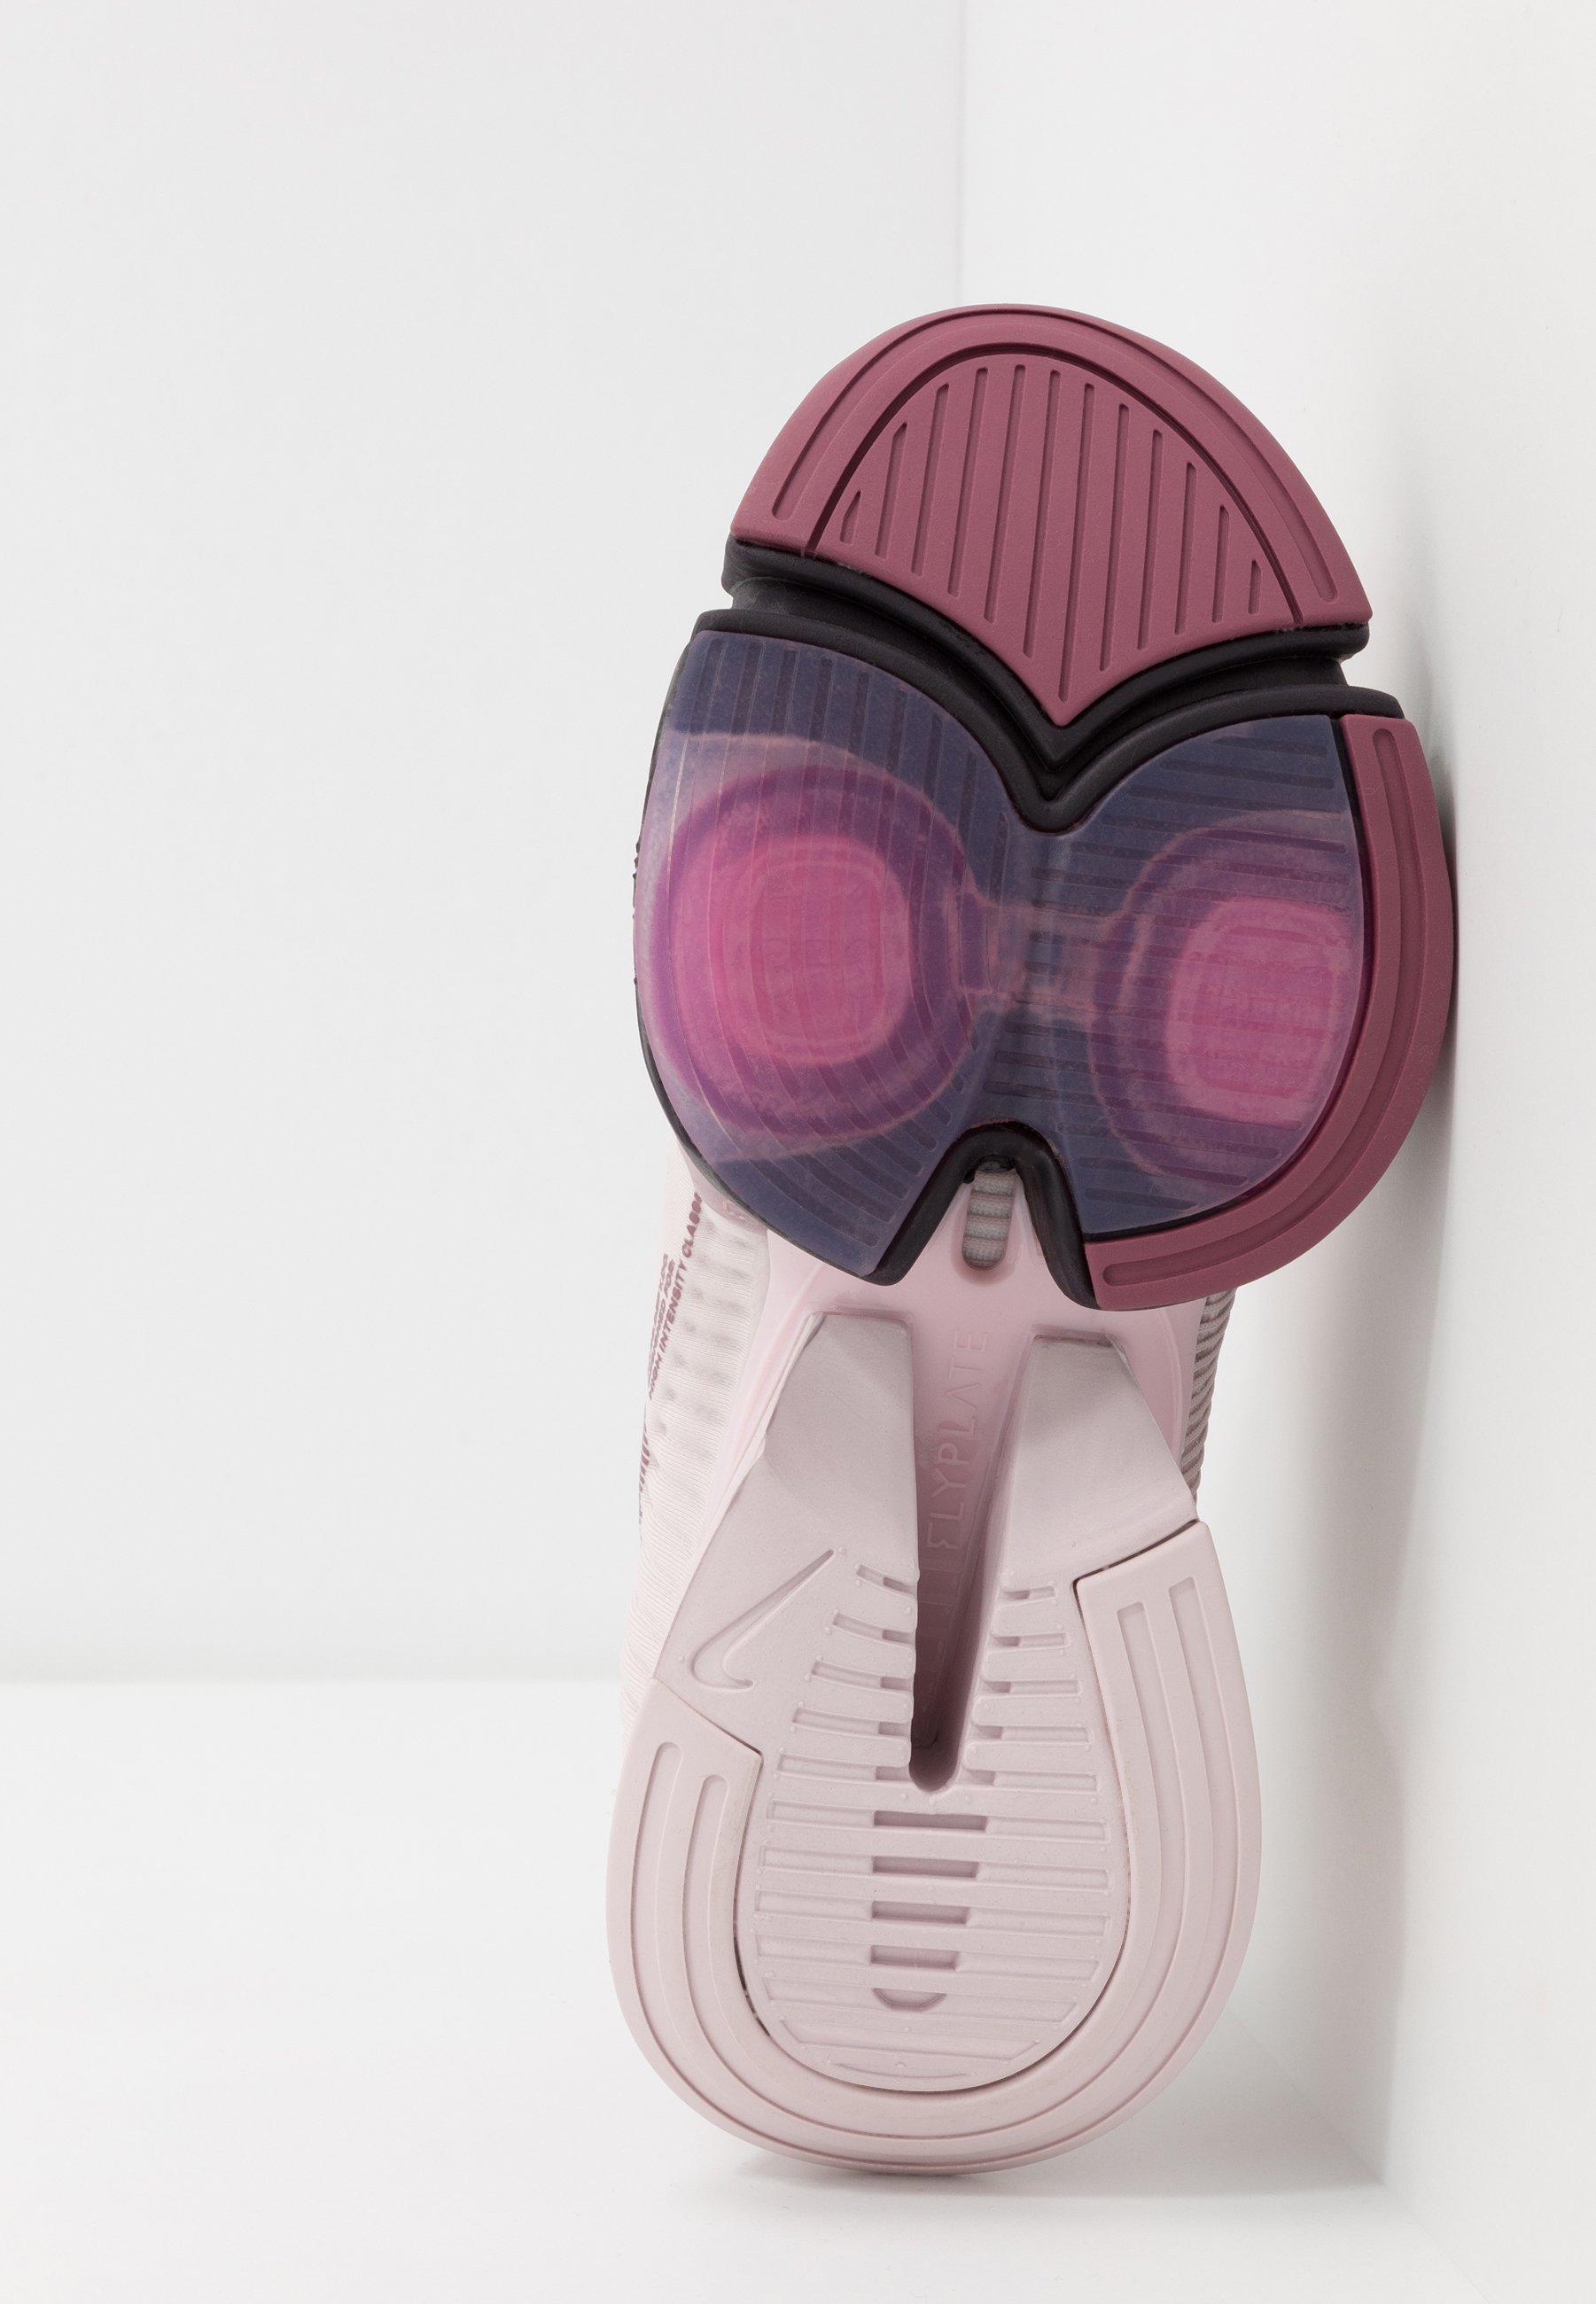 AIR ZOOM SUPERREP Chaussures d'entraînement et de fitness barely roseburgundy ashshadowberrycosmic fuchsia